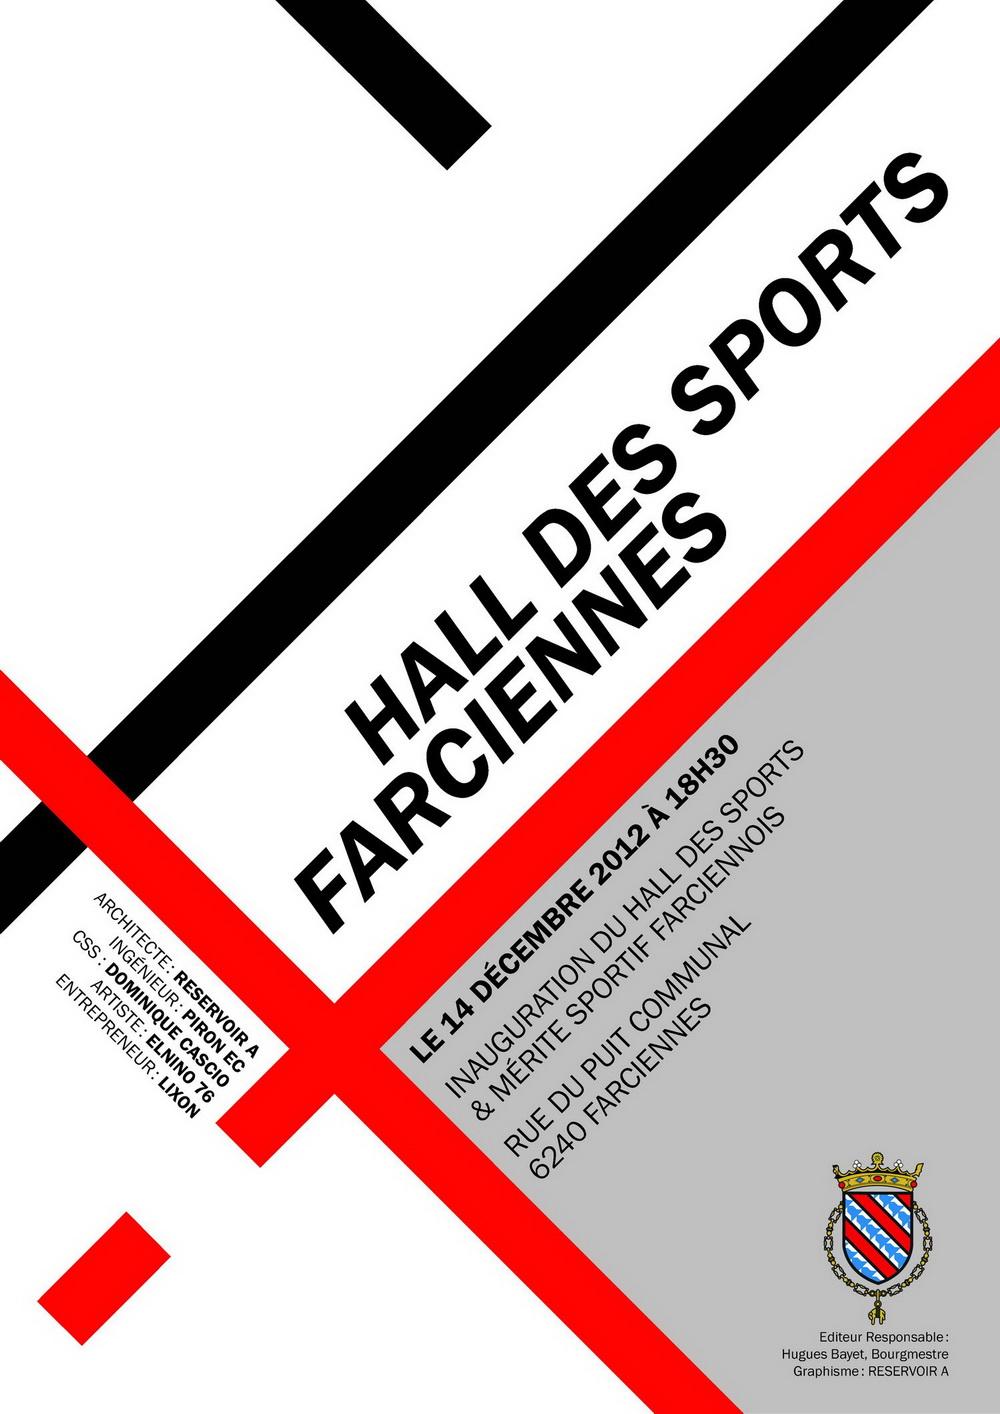 Inauguration Hall des Sports de Farciennes